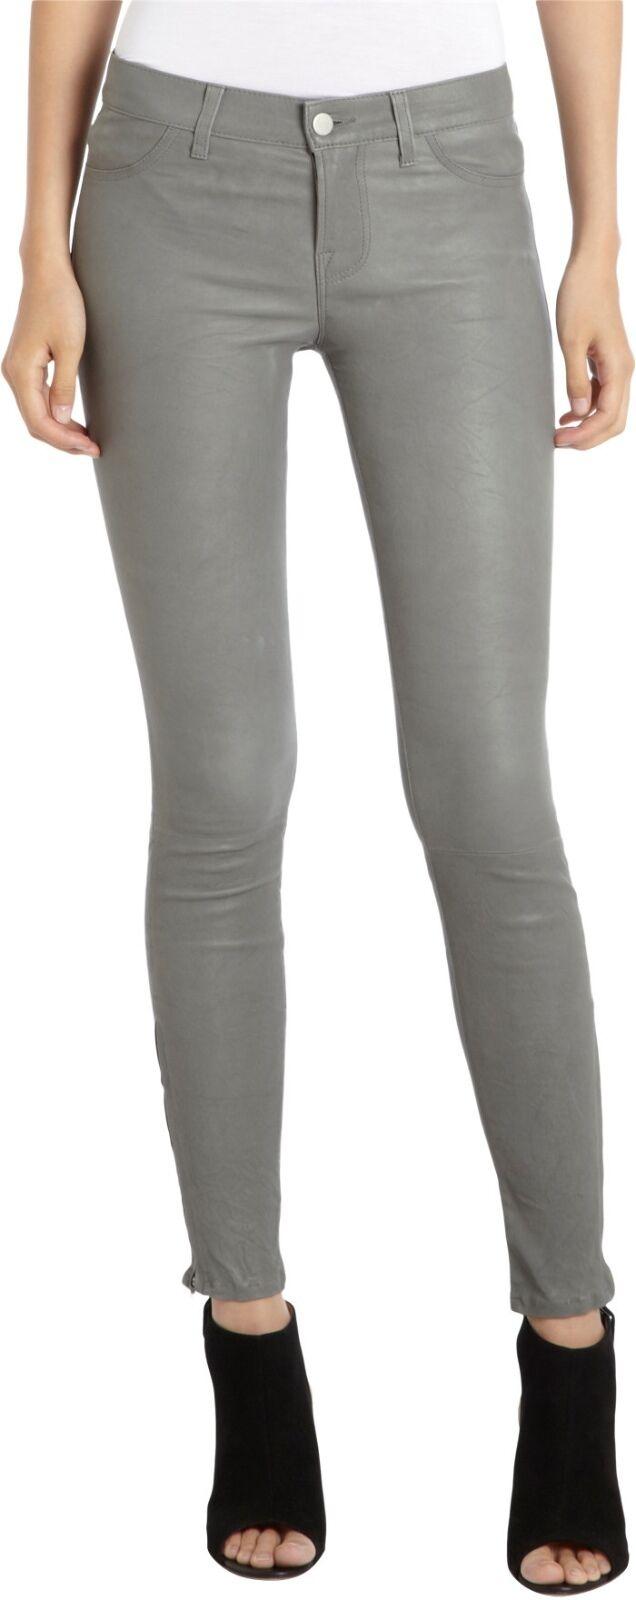 J BRAND SUPER SKINNY LEATHER JEANS Pants L8001 color Cement Grey